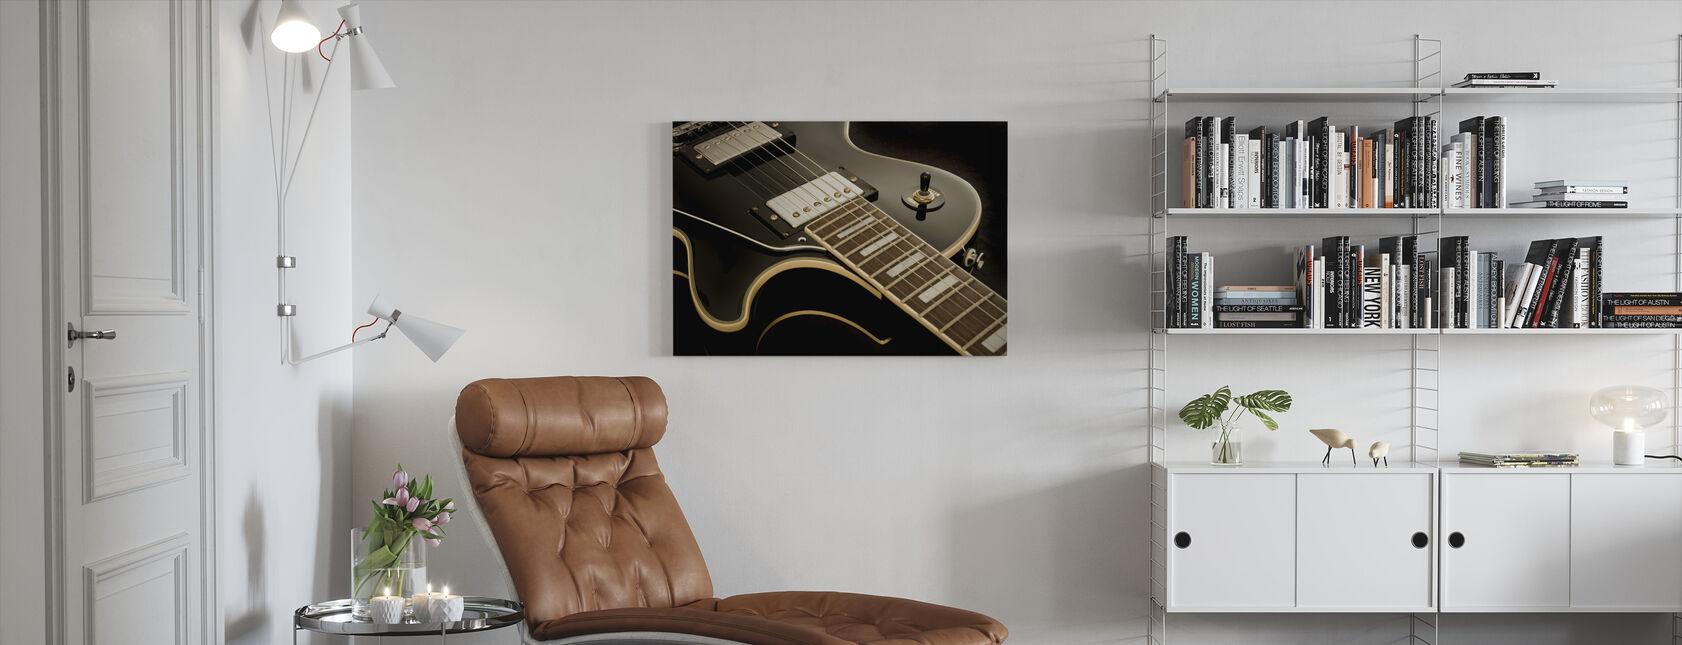 Vintage Gitarr - Canvastavla - Vardagsrum